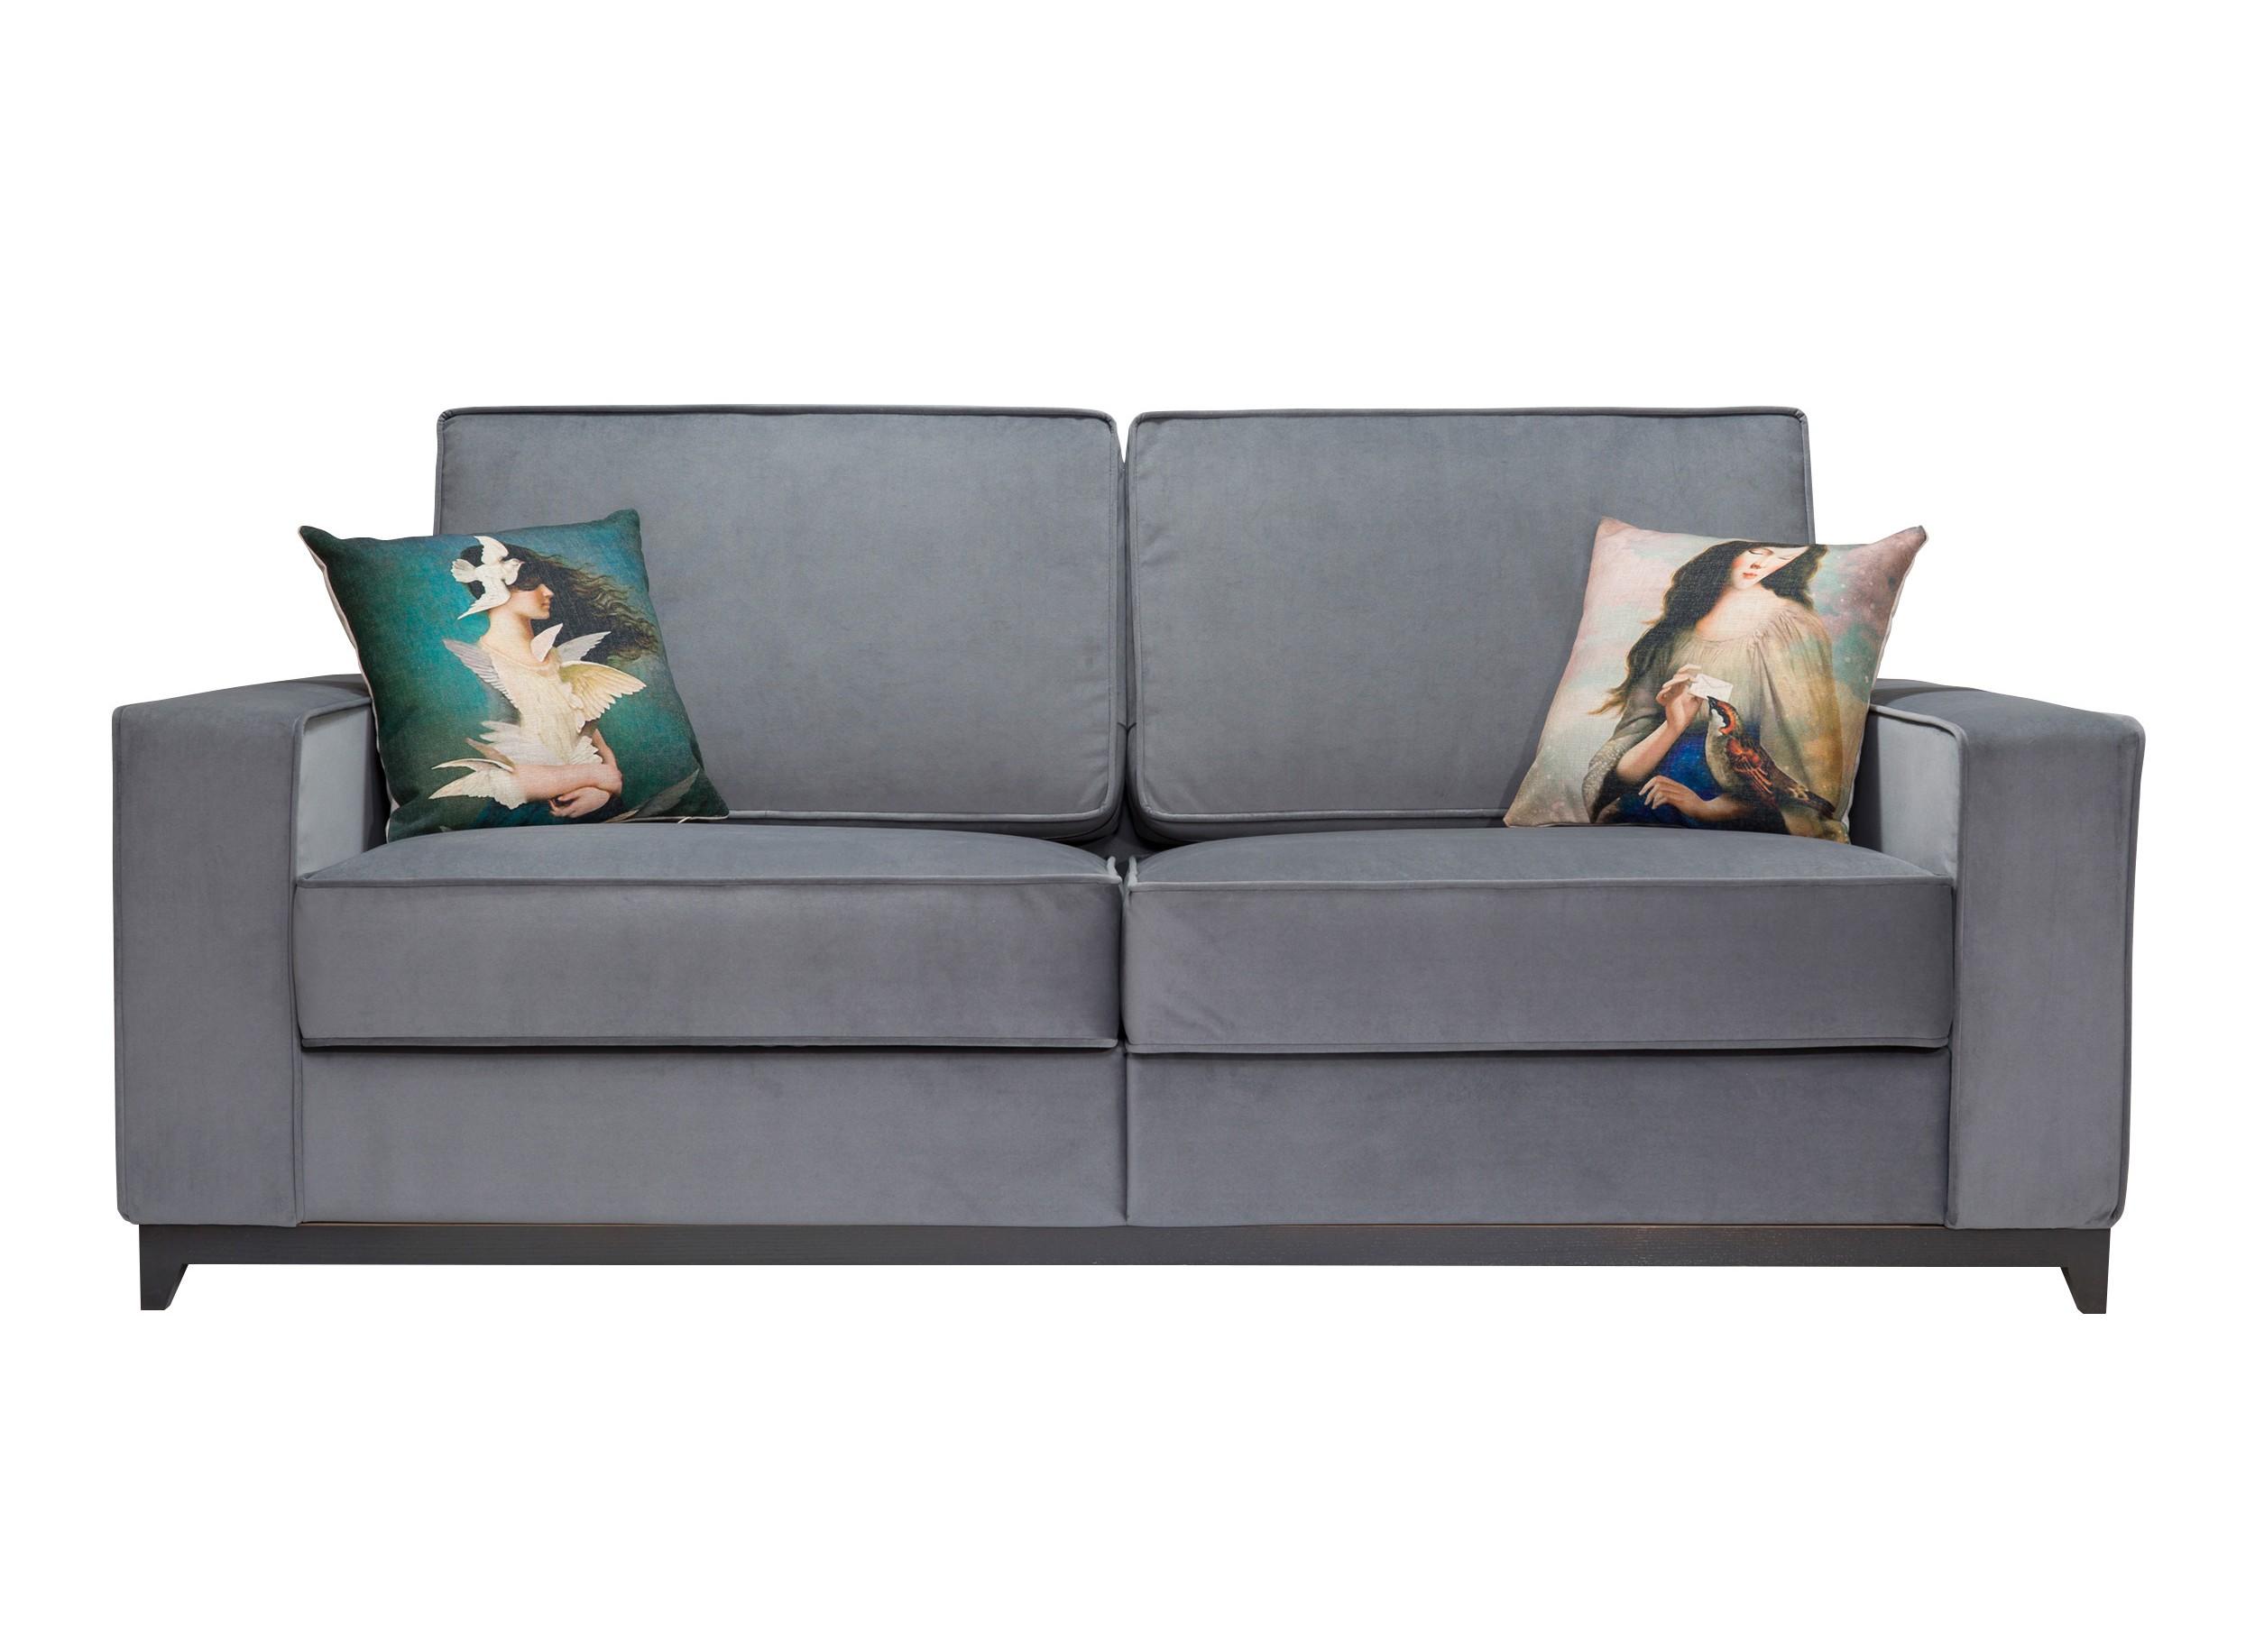 Myfurnish диван-кровать orlando серый 64907/40982